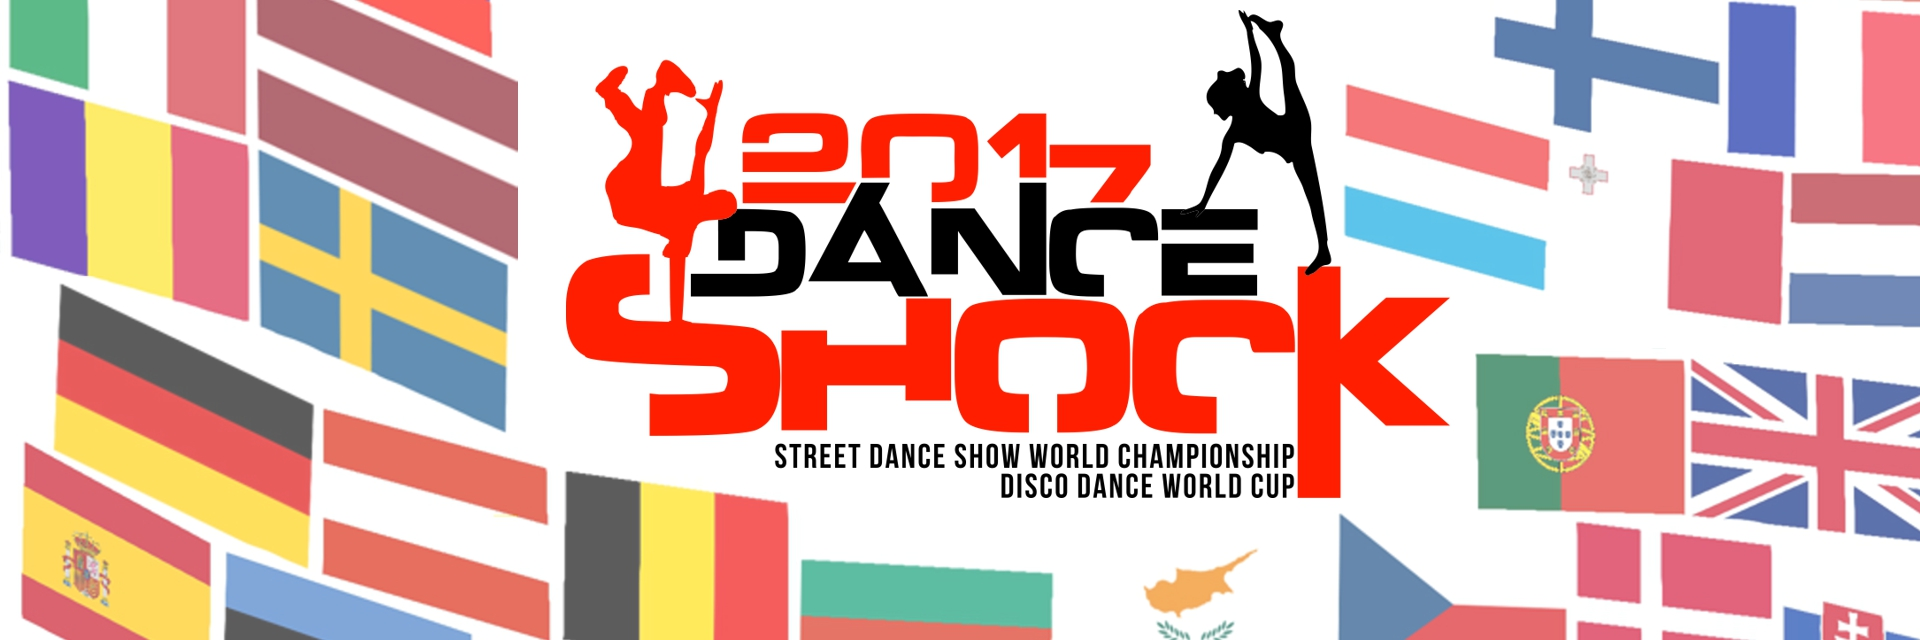 DANCE SHOCK 2017